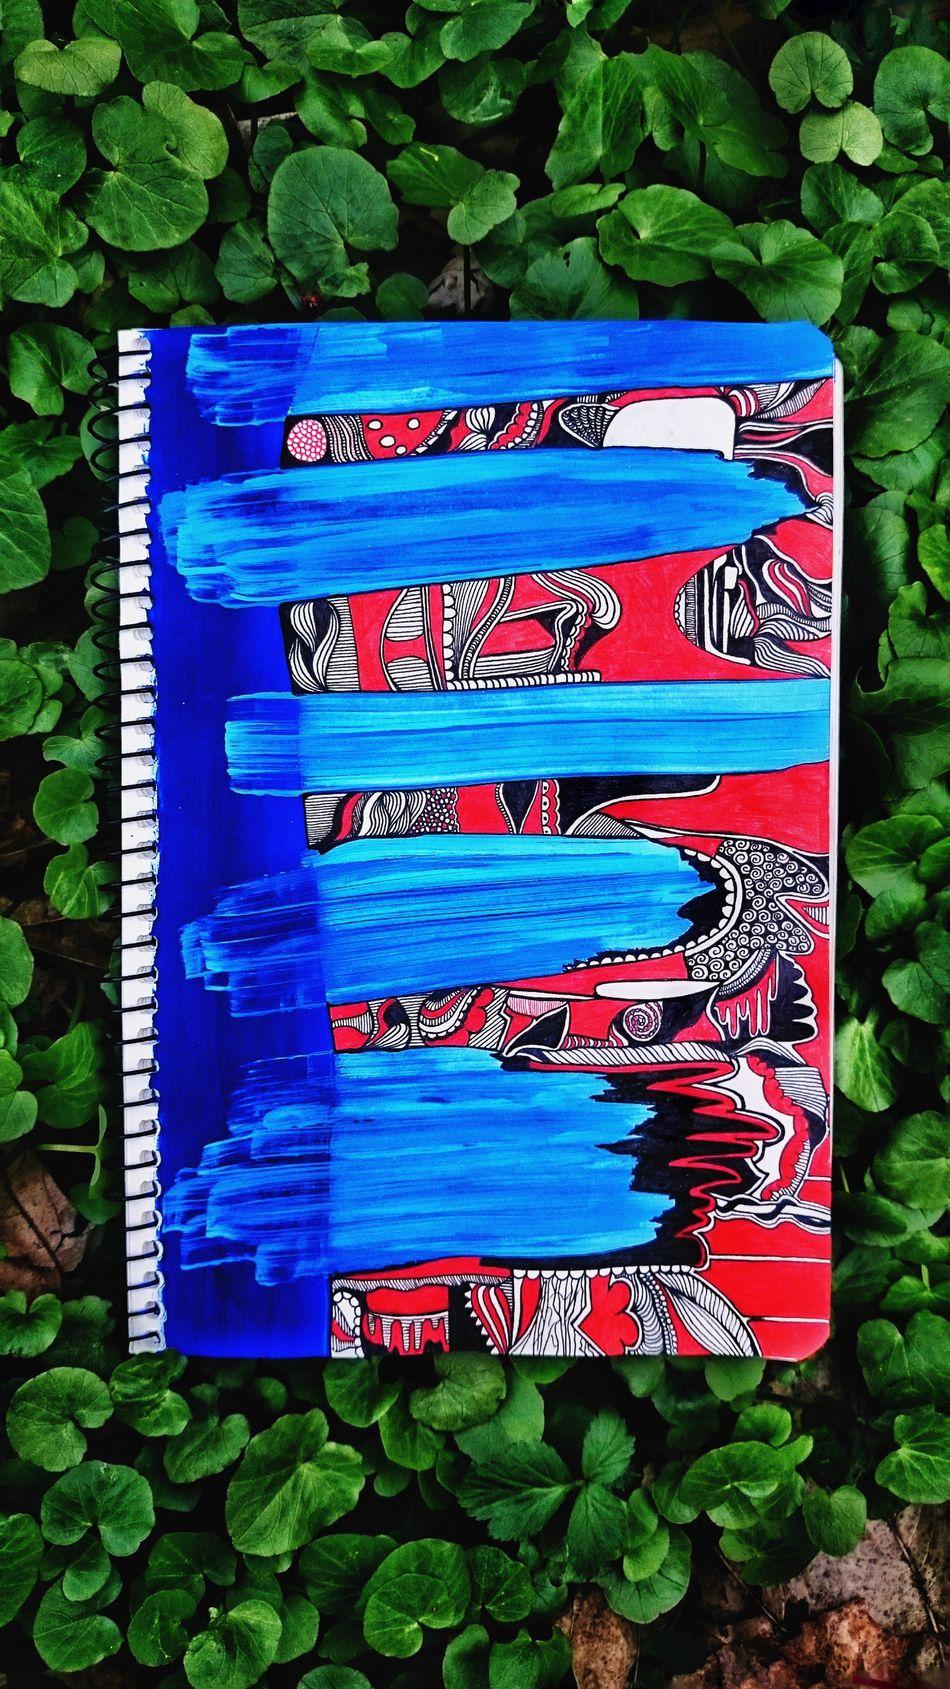 Text No People EyeEm Free Art Beauty Inspirations ArtWork Illustration Outdoors Tranquility Paper Sketchbook Sketching Creativity Sketch Ukraine First Eyeem Photo Followme Art, Drawing, Creativity Lviv EyeEm Best Shots Green Color Sketch Art Lviv, Ukraine